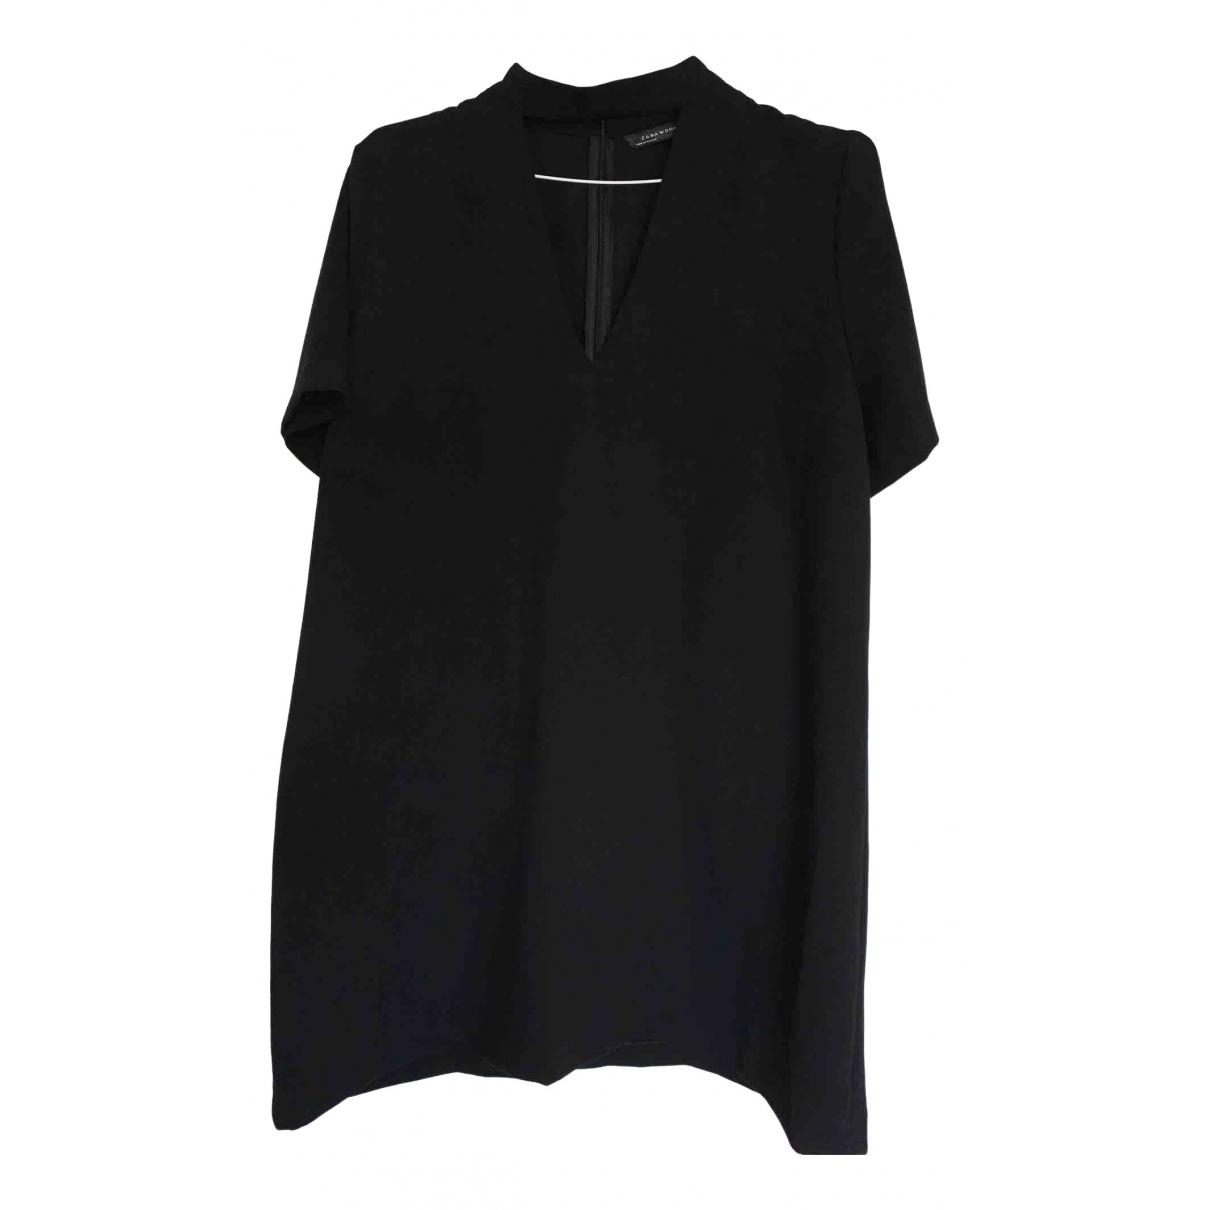 Zara \N Black dress for Women XL International